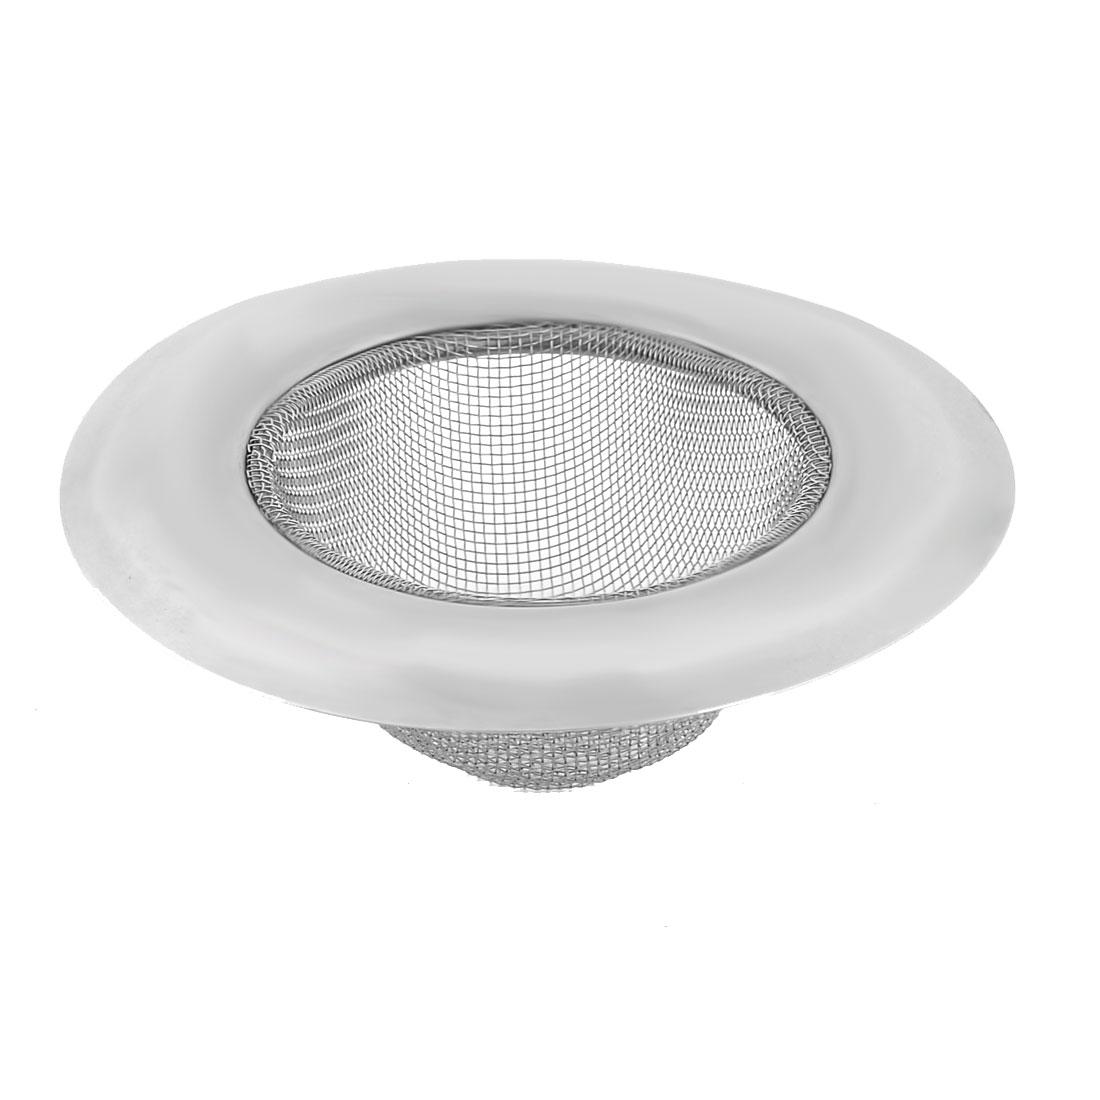 Household Mesh Basket Metal Round Sanitary Sink Drain Strainer Silver Tone